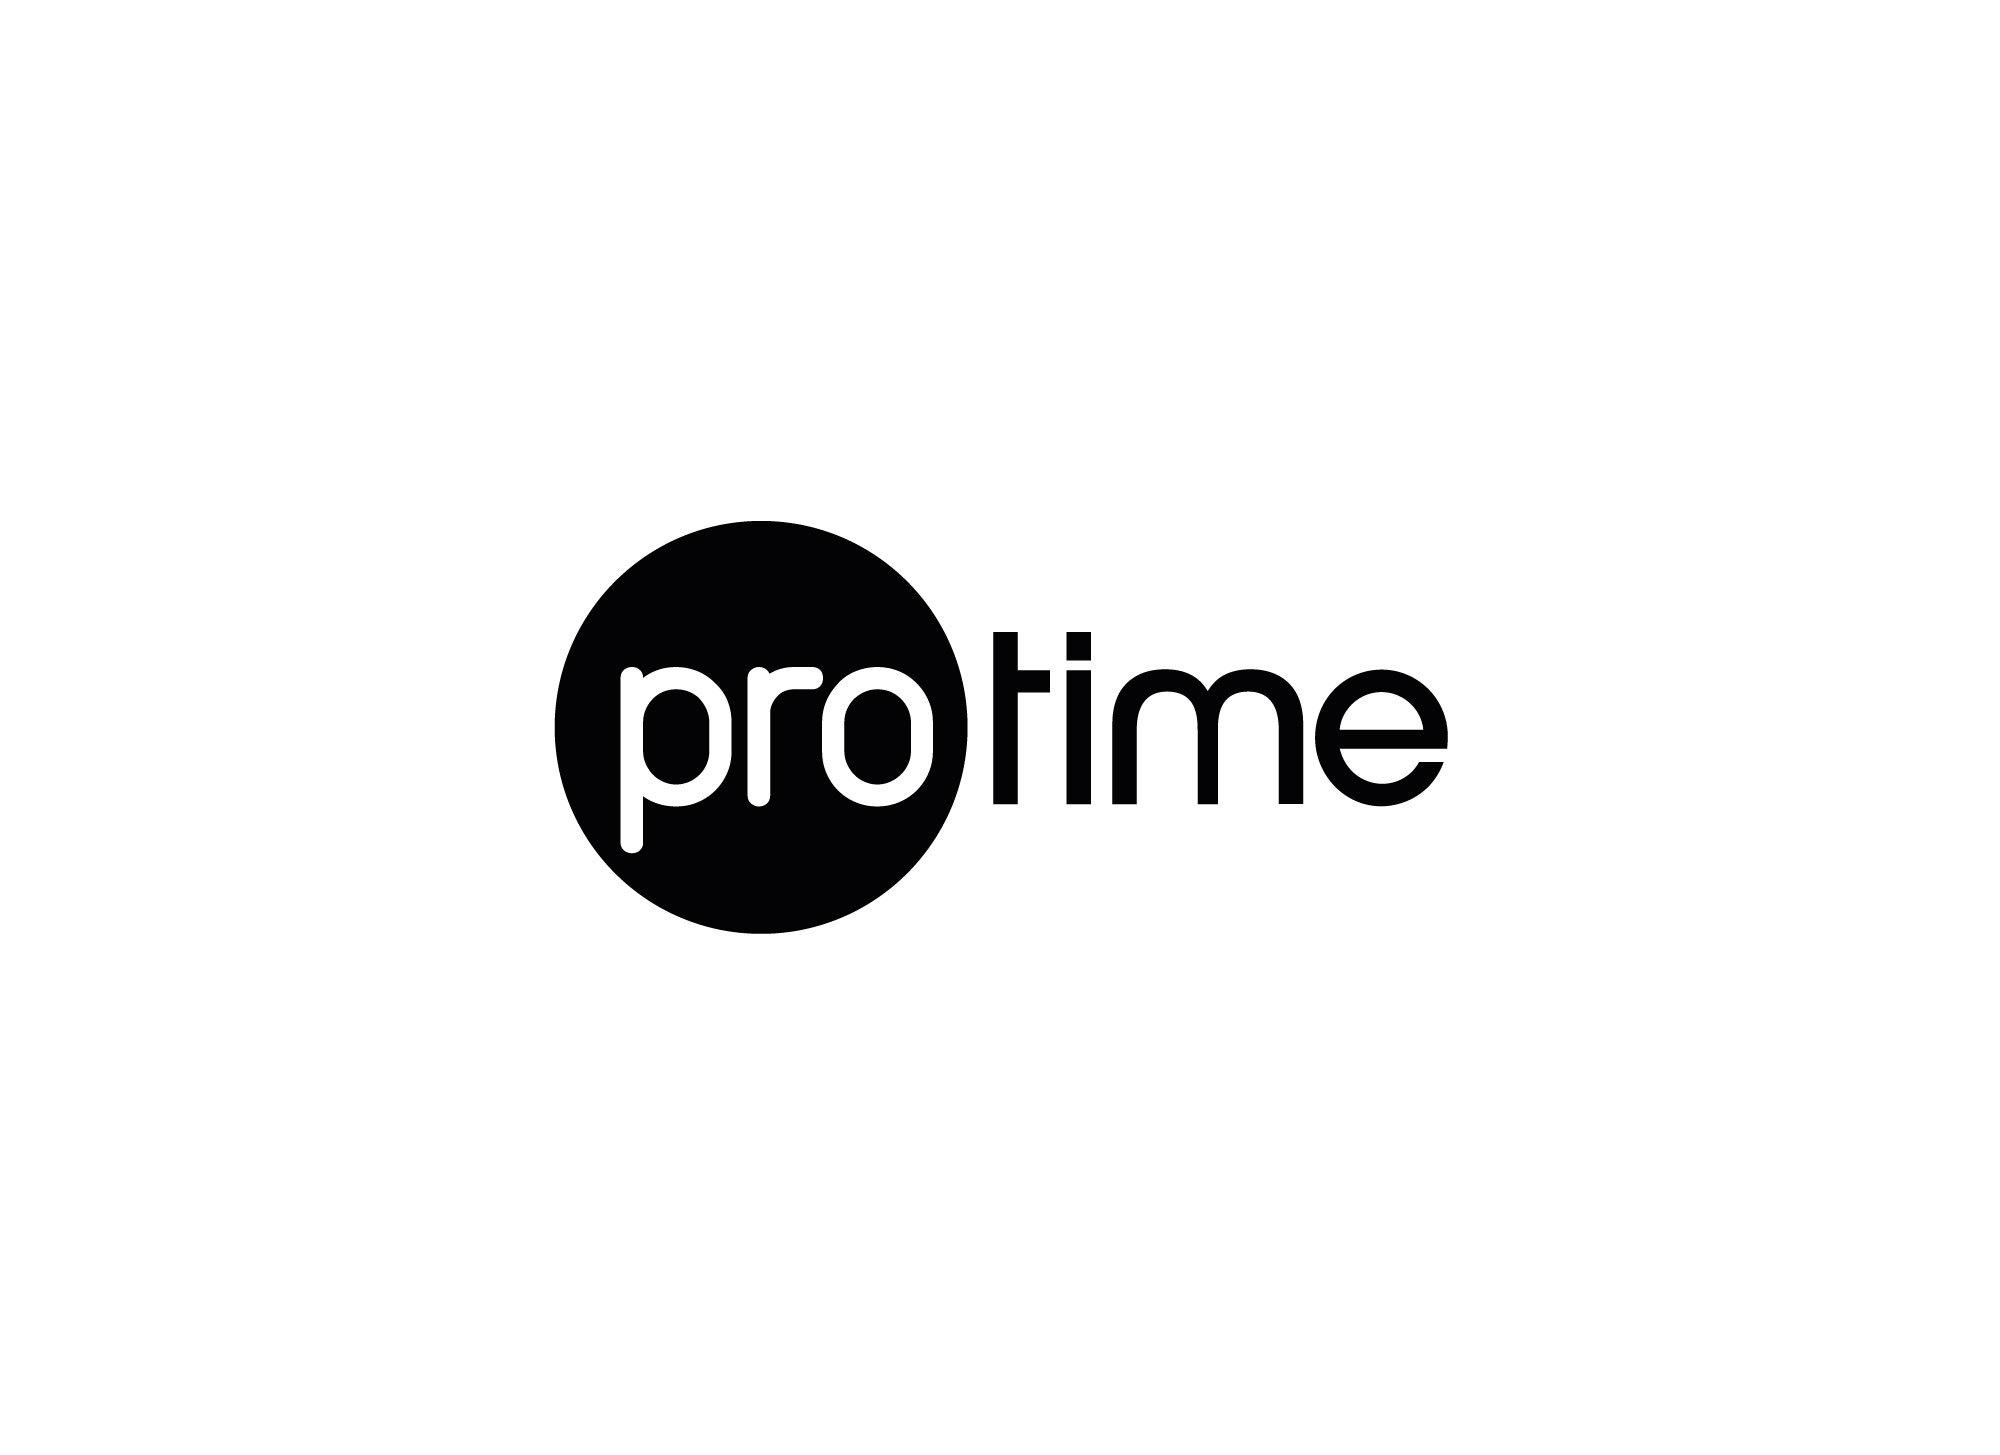 Logo — Protime Brand Manual